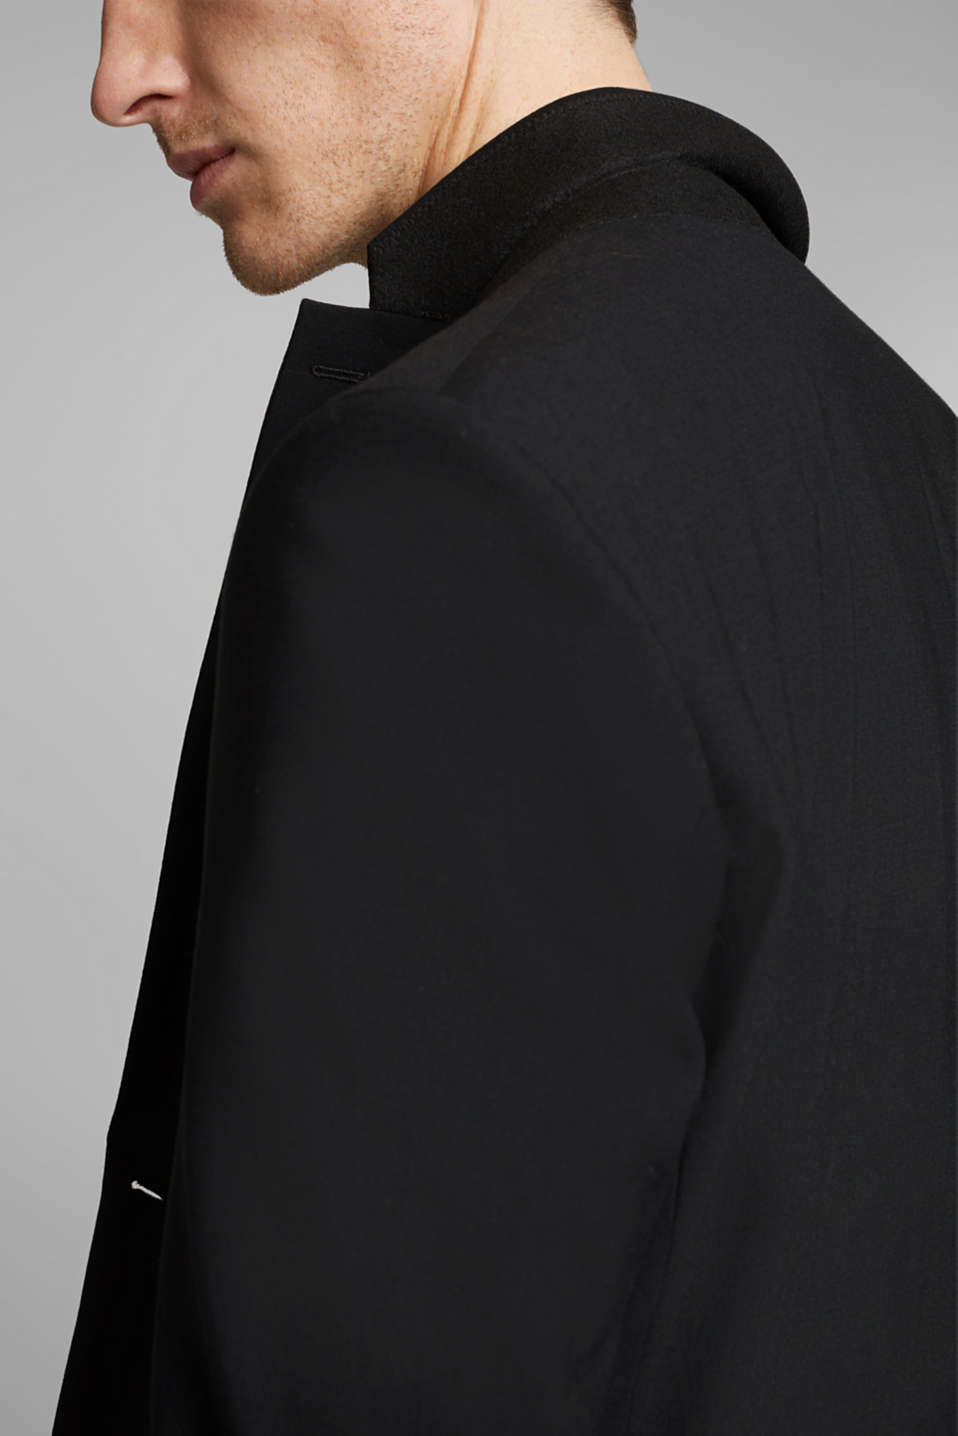 ACTIVE SUIT tailored jacket, wool blend, BLACK, detail image number 2